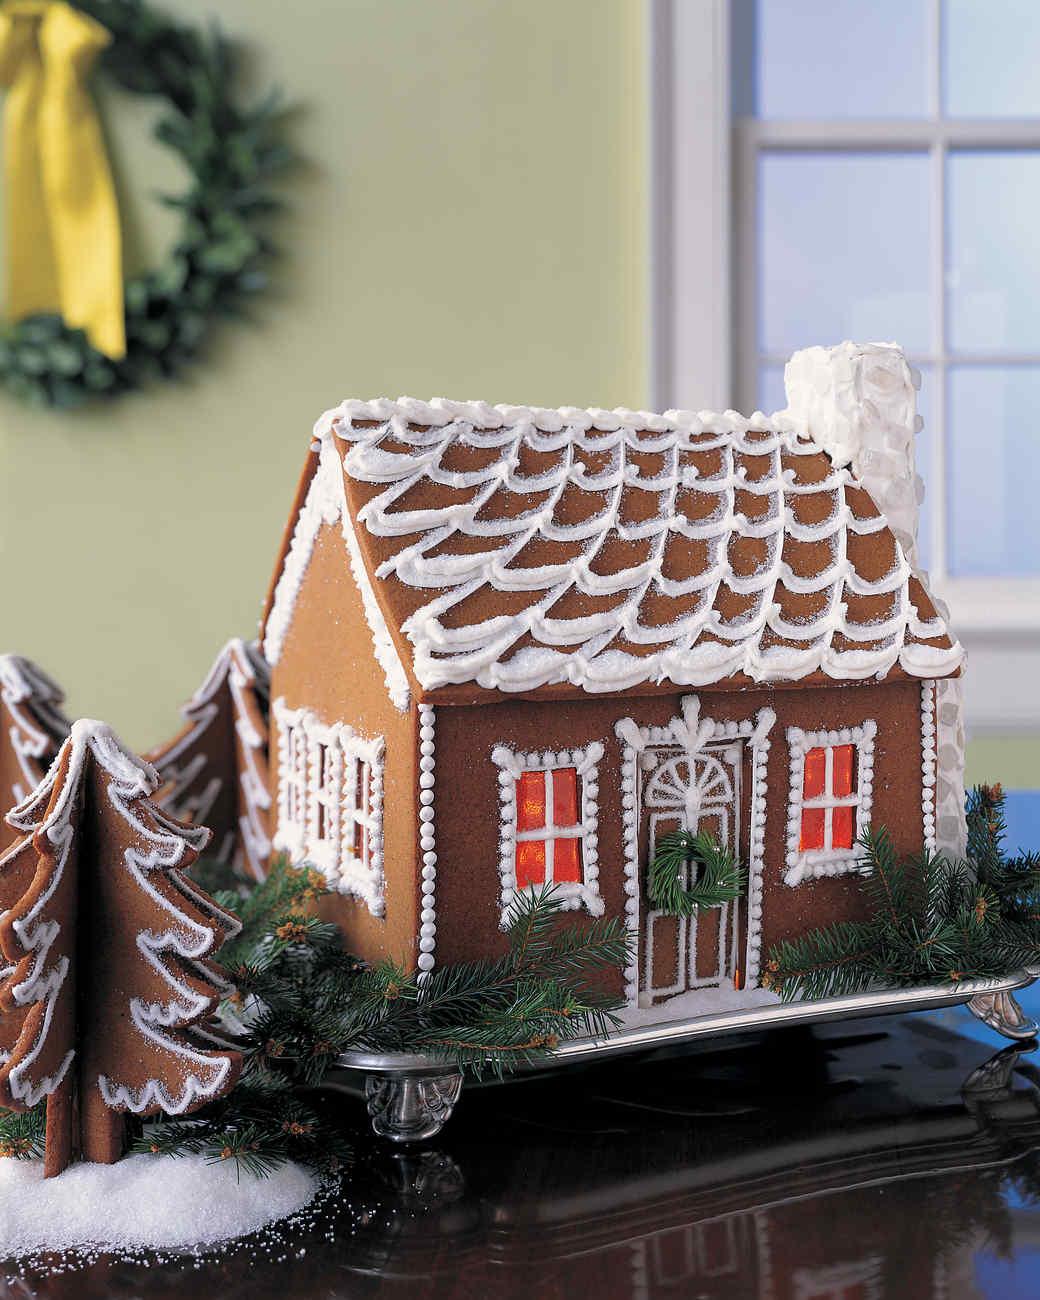 a97097_hol09_house_snowswept.jpg